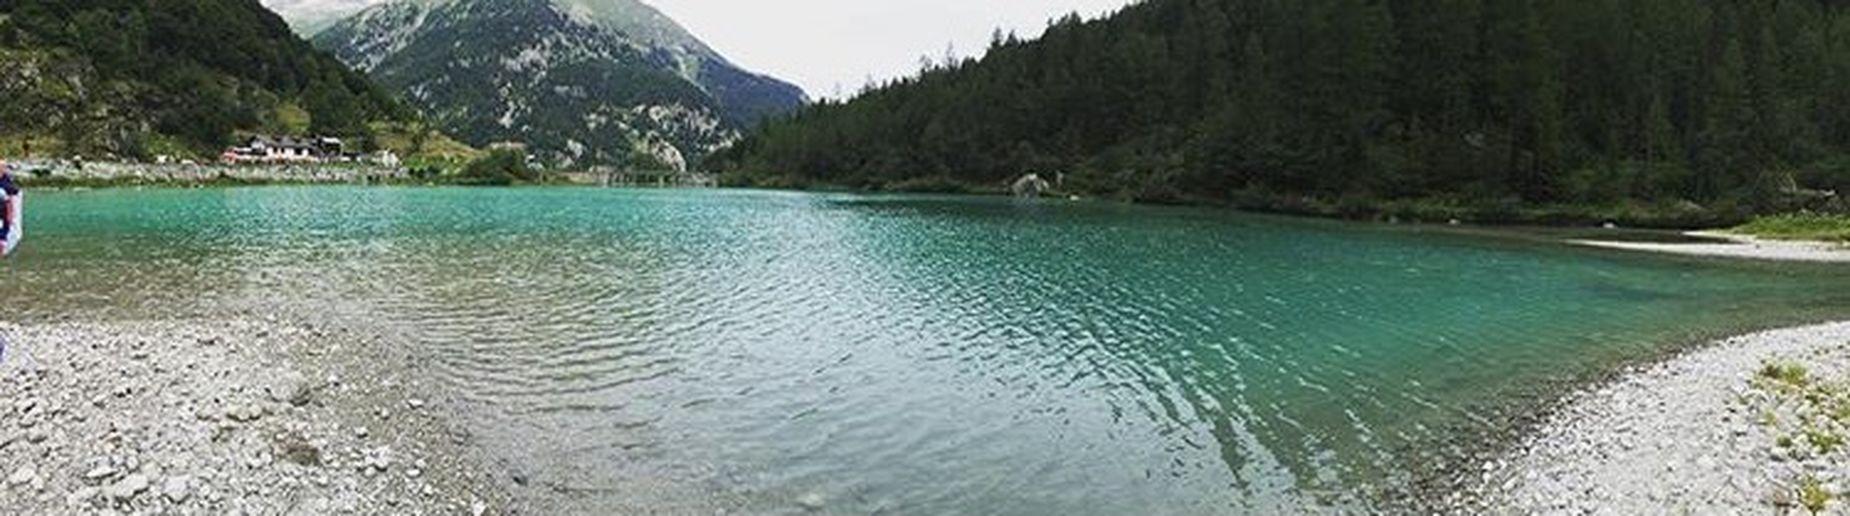 Acquacristallina Paesaggio Passeggiando Montagna